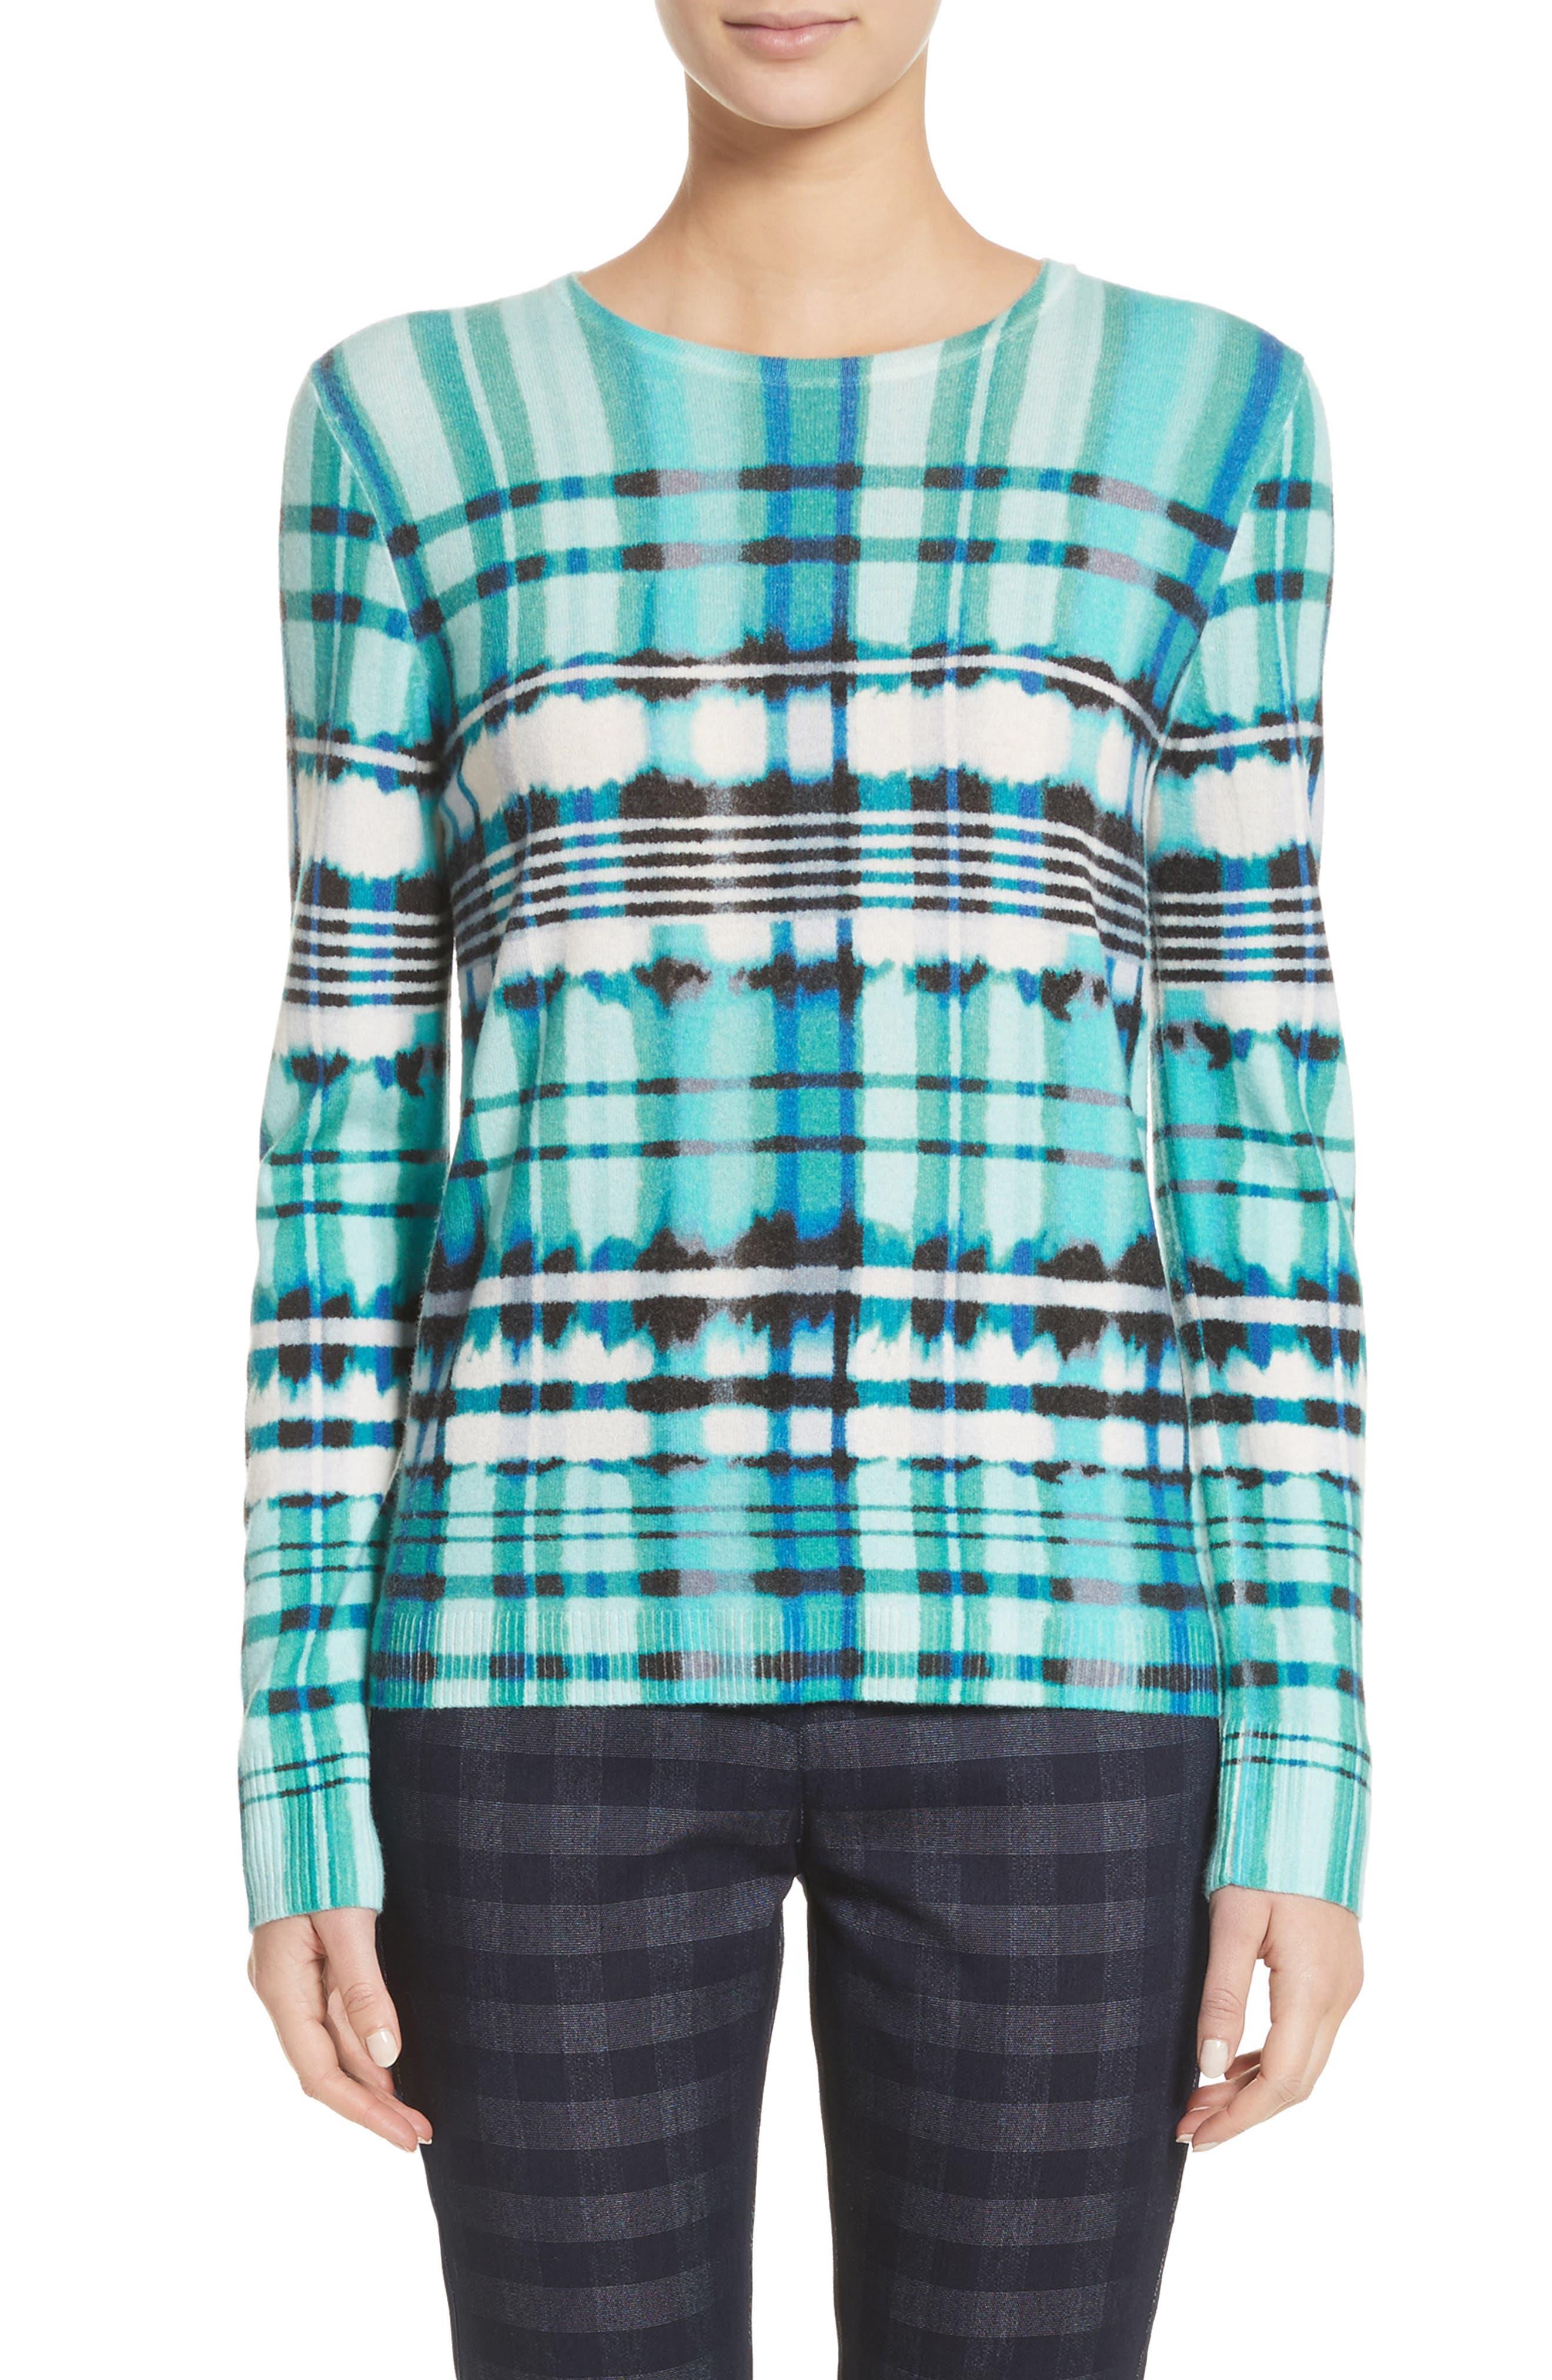 Overprint Plaid Cashmere Sweater,                         Main,                         color, 350